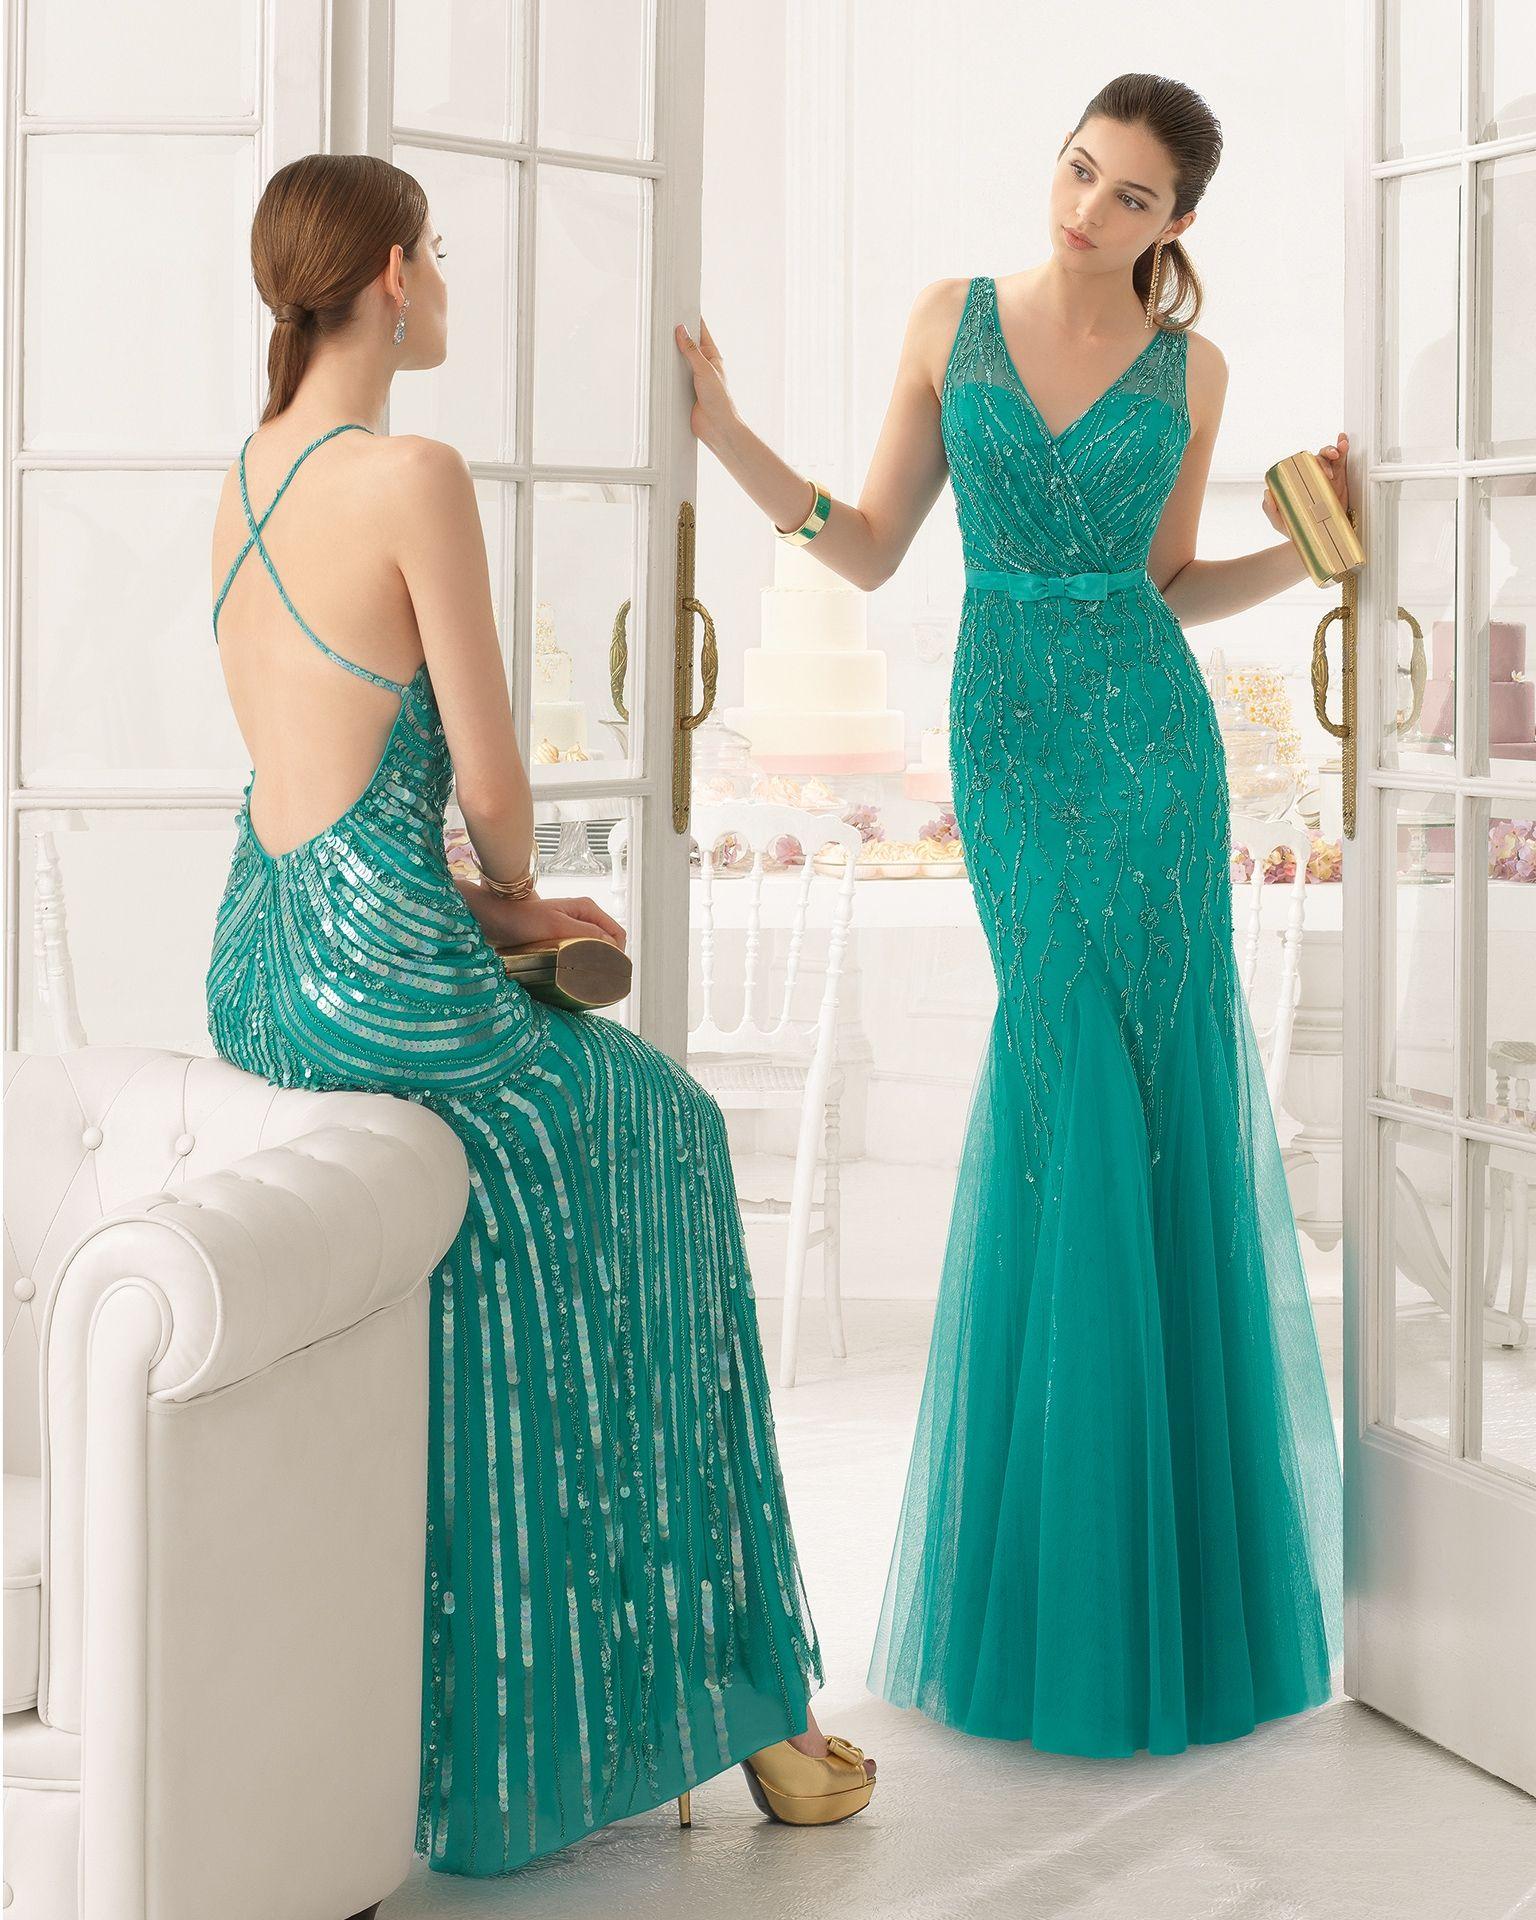 Elegancia | bautizo | Pinterest | Vestidos de fiesta largos, Aire ...